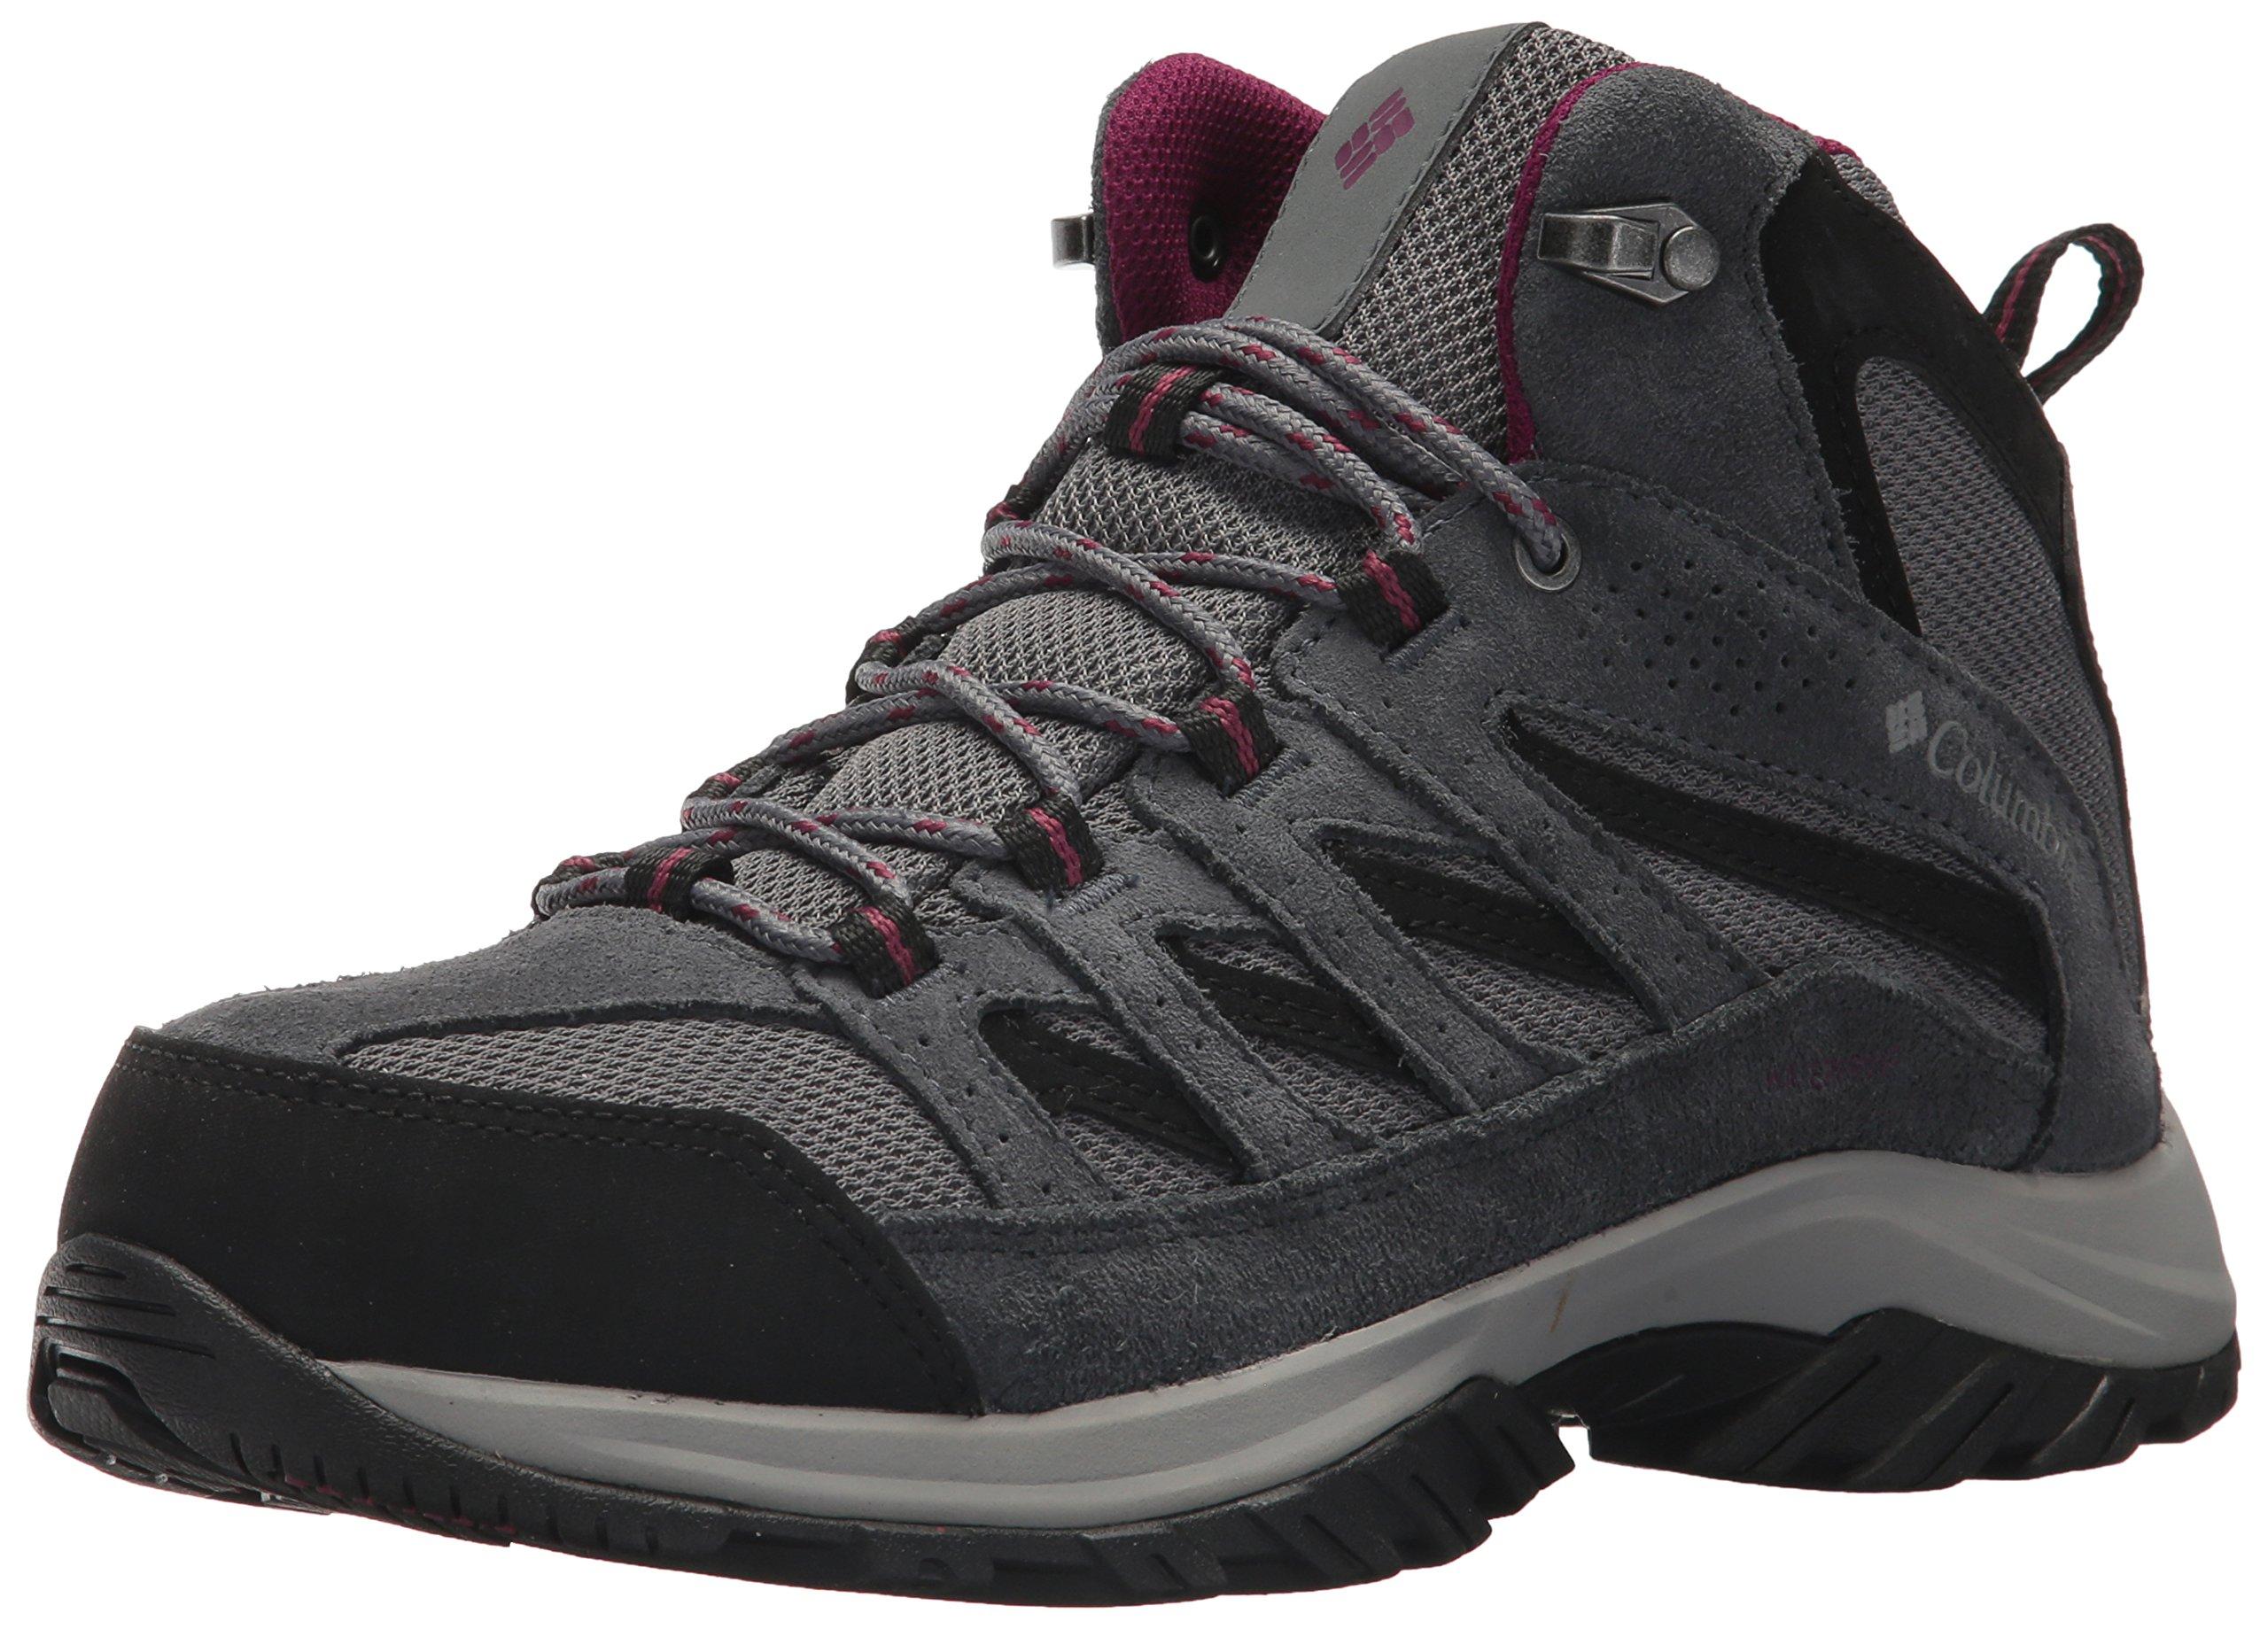 Columbia Women's Crestwood Mid Waterproof Hiking Boot,ti grey steel, dark raspberry,8.5 Regular US by Columbia